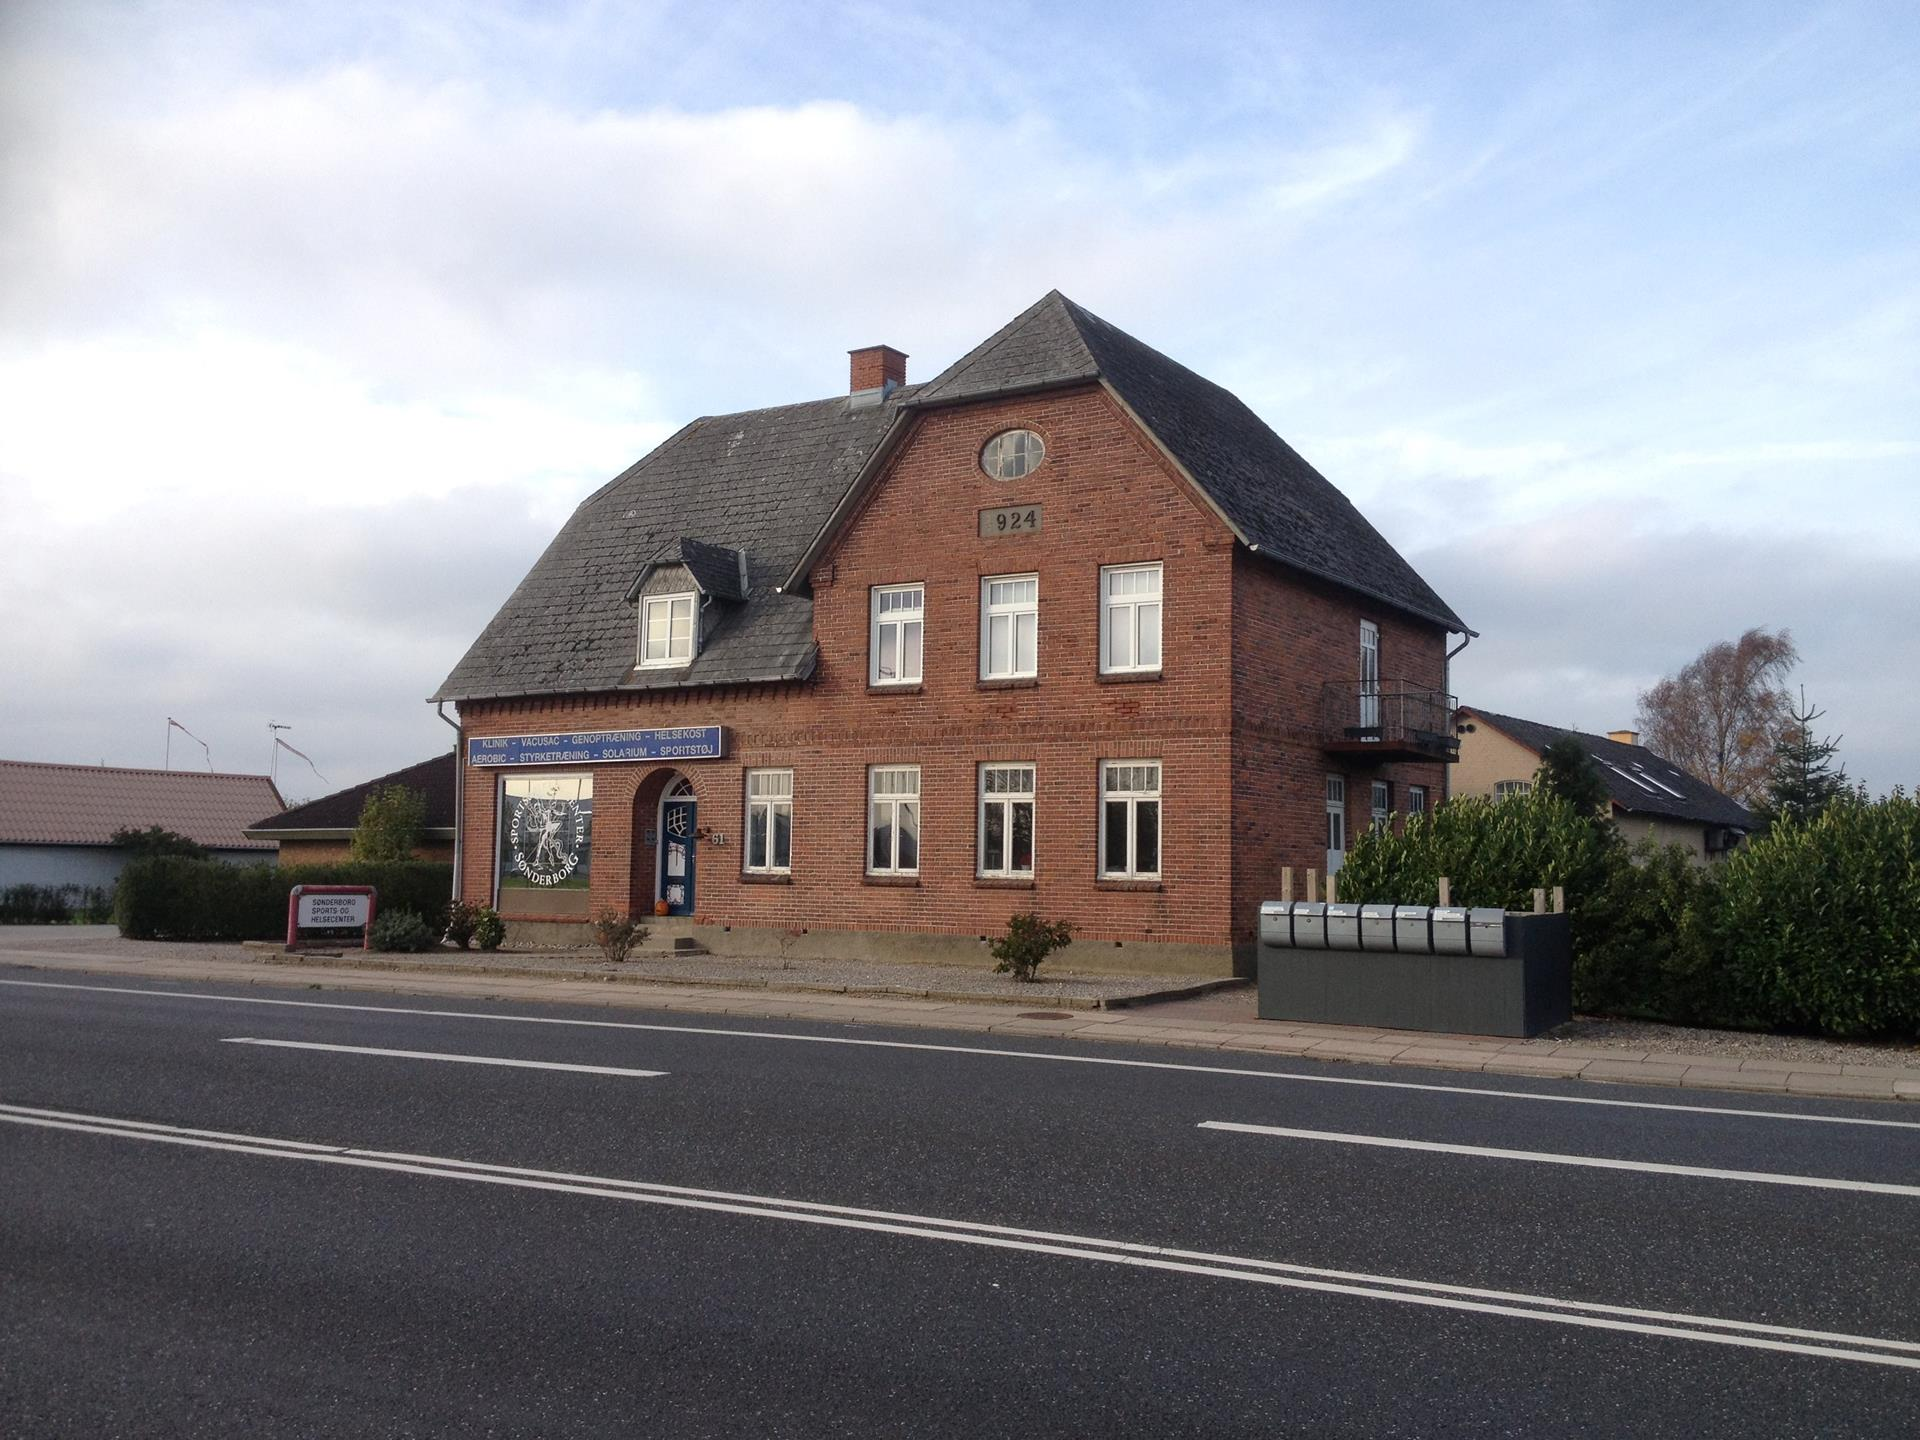 Bolig/erhverv på Augustenborg Landevej i Sønderborg - Facade